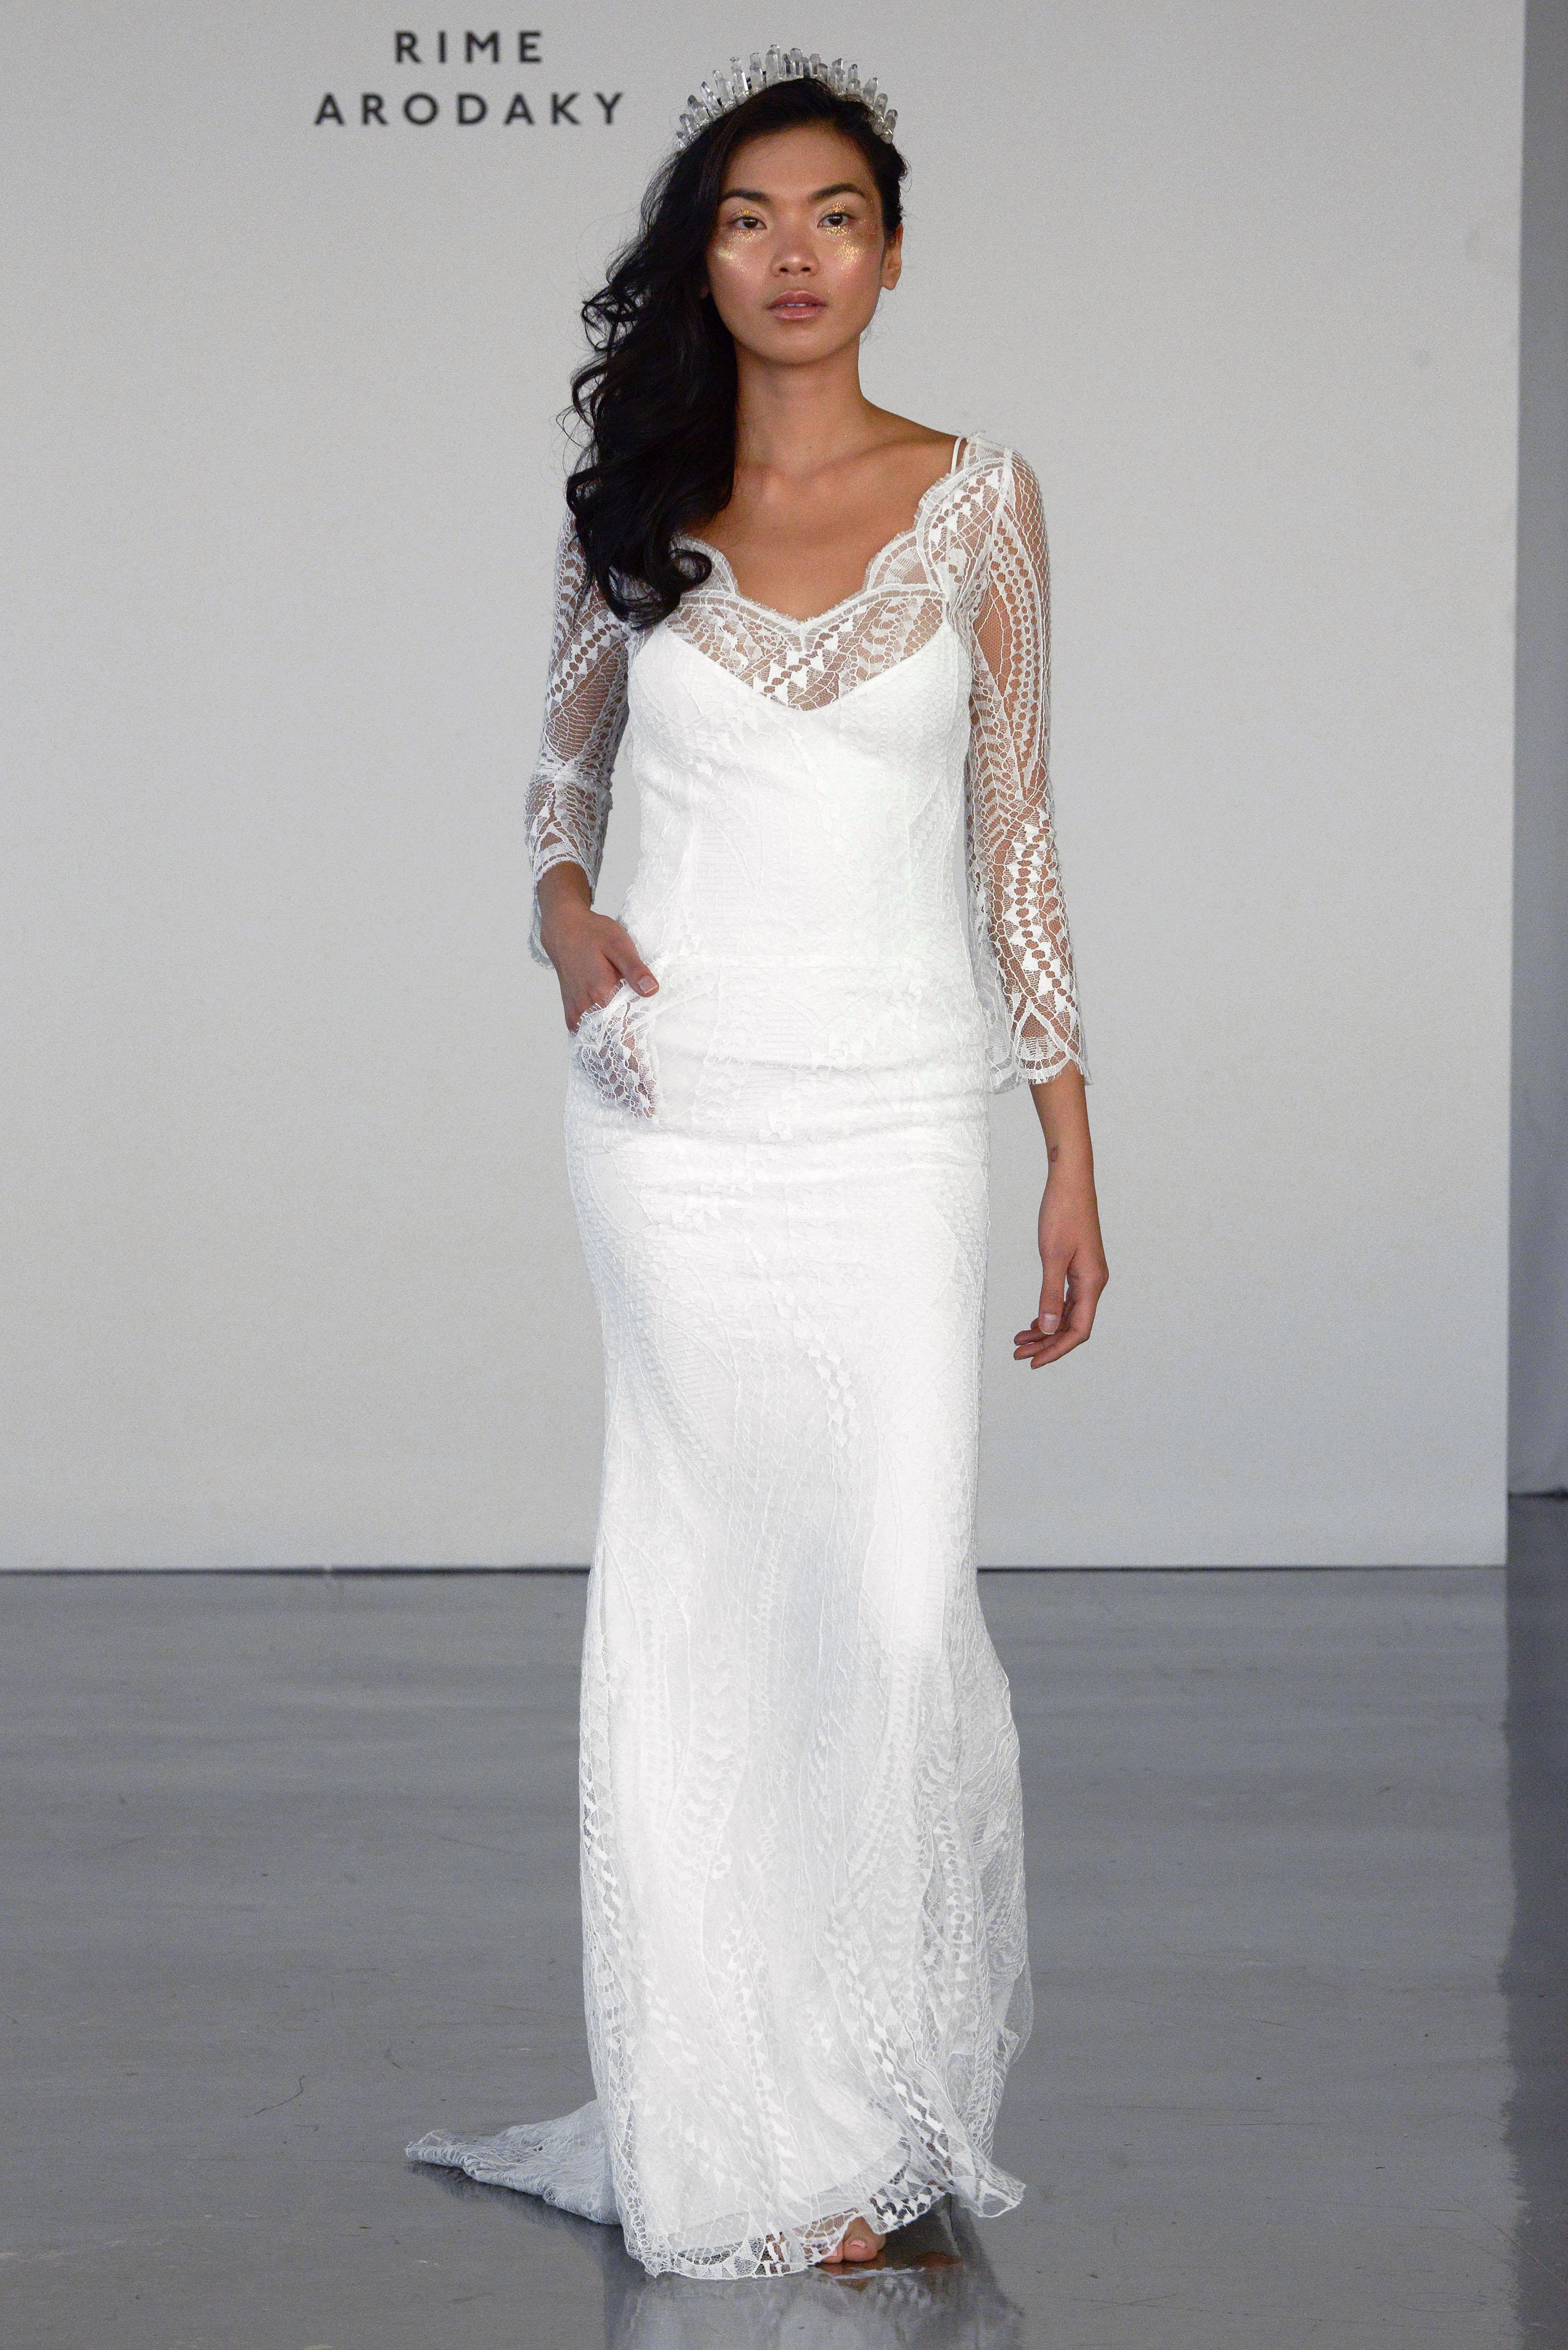 Rime Arodaky wedding dress - 2 Fall 2017